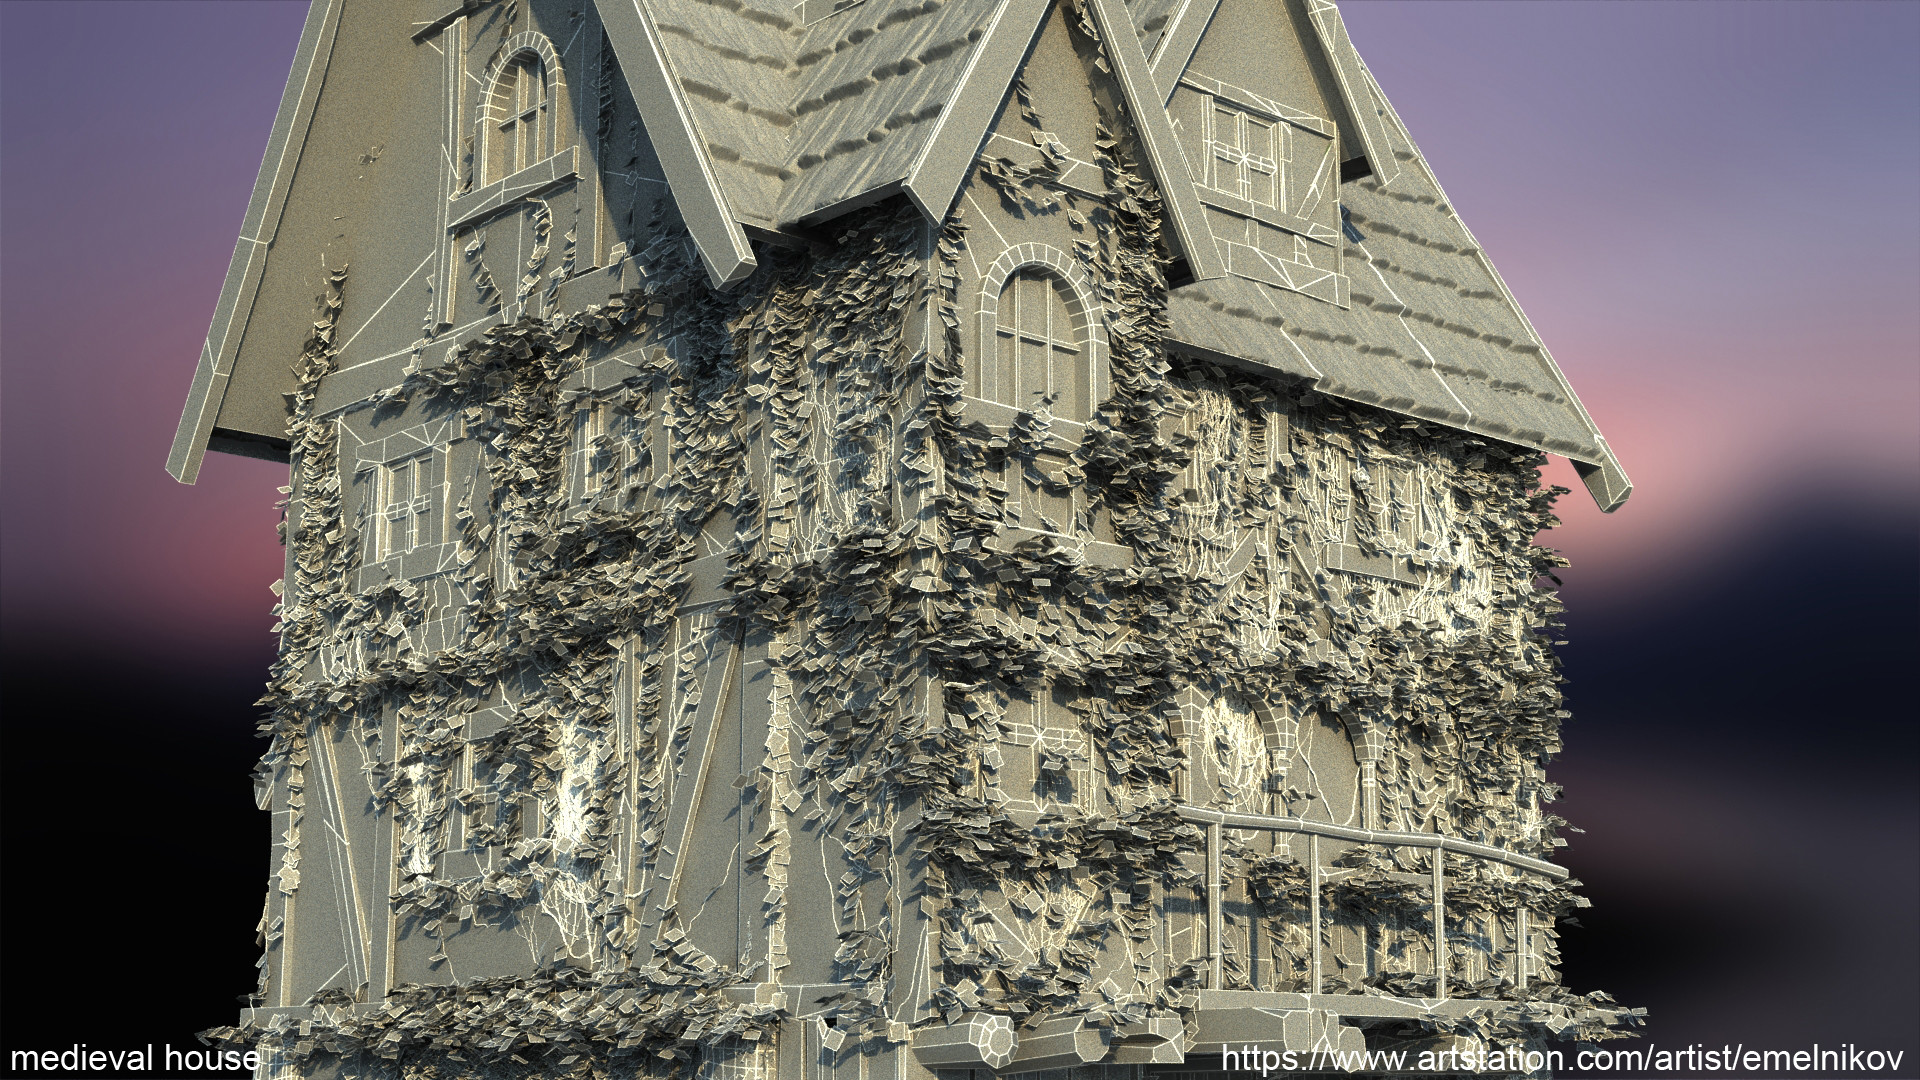 Eugene melnikov medieval house1 render frm8 wire